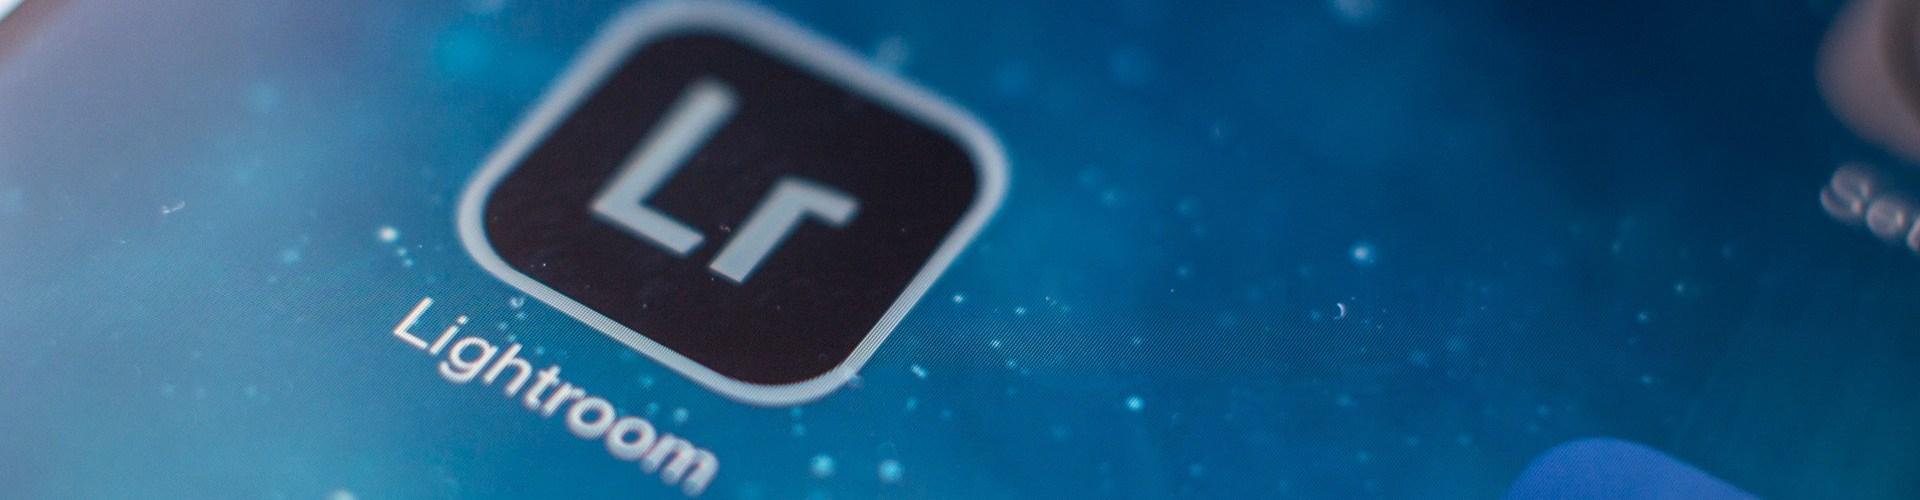 Tải về Adobe Lightroom CC Full 4.4.1 Apk Android (MOD , Premium Unlocked Full Tính Năng)